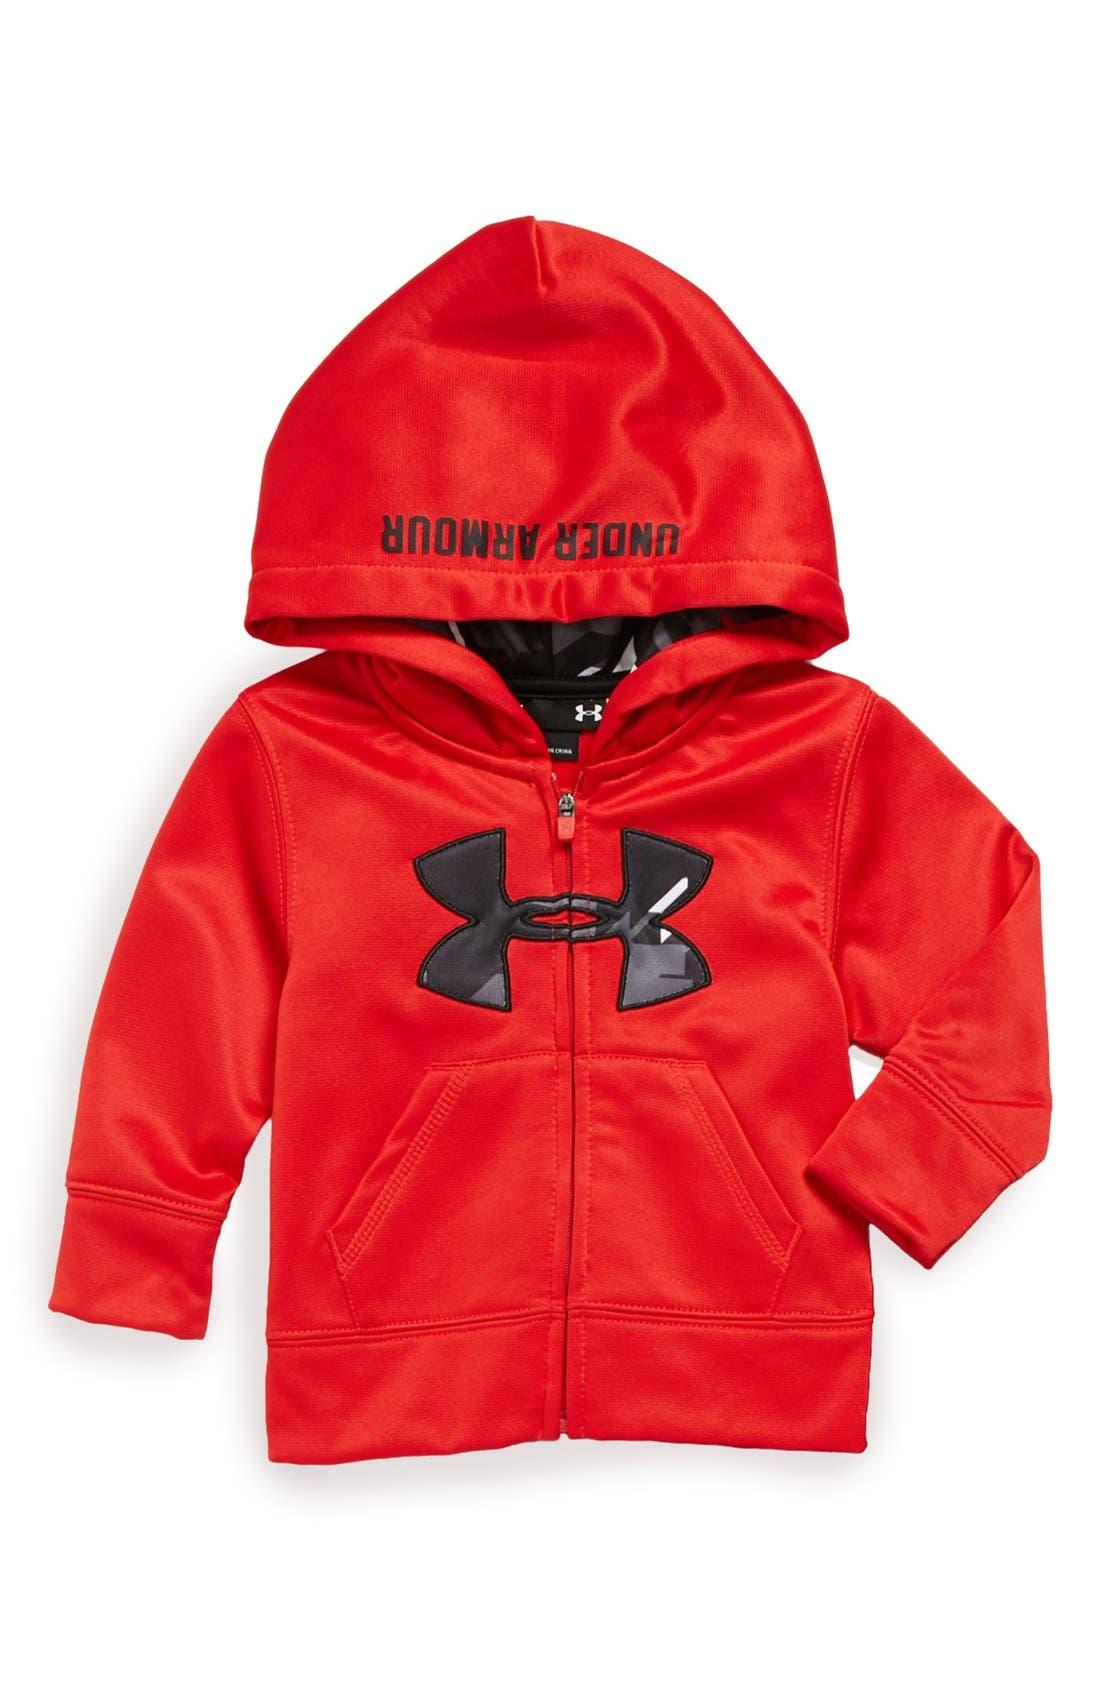 Alternate Image 1 Selected - Under Armour 'Edge' Camo Logo Hoodie (Toddler Boys)